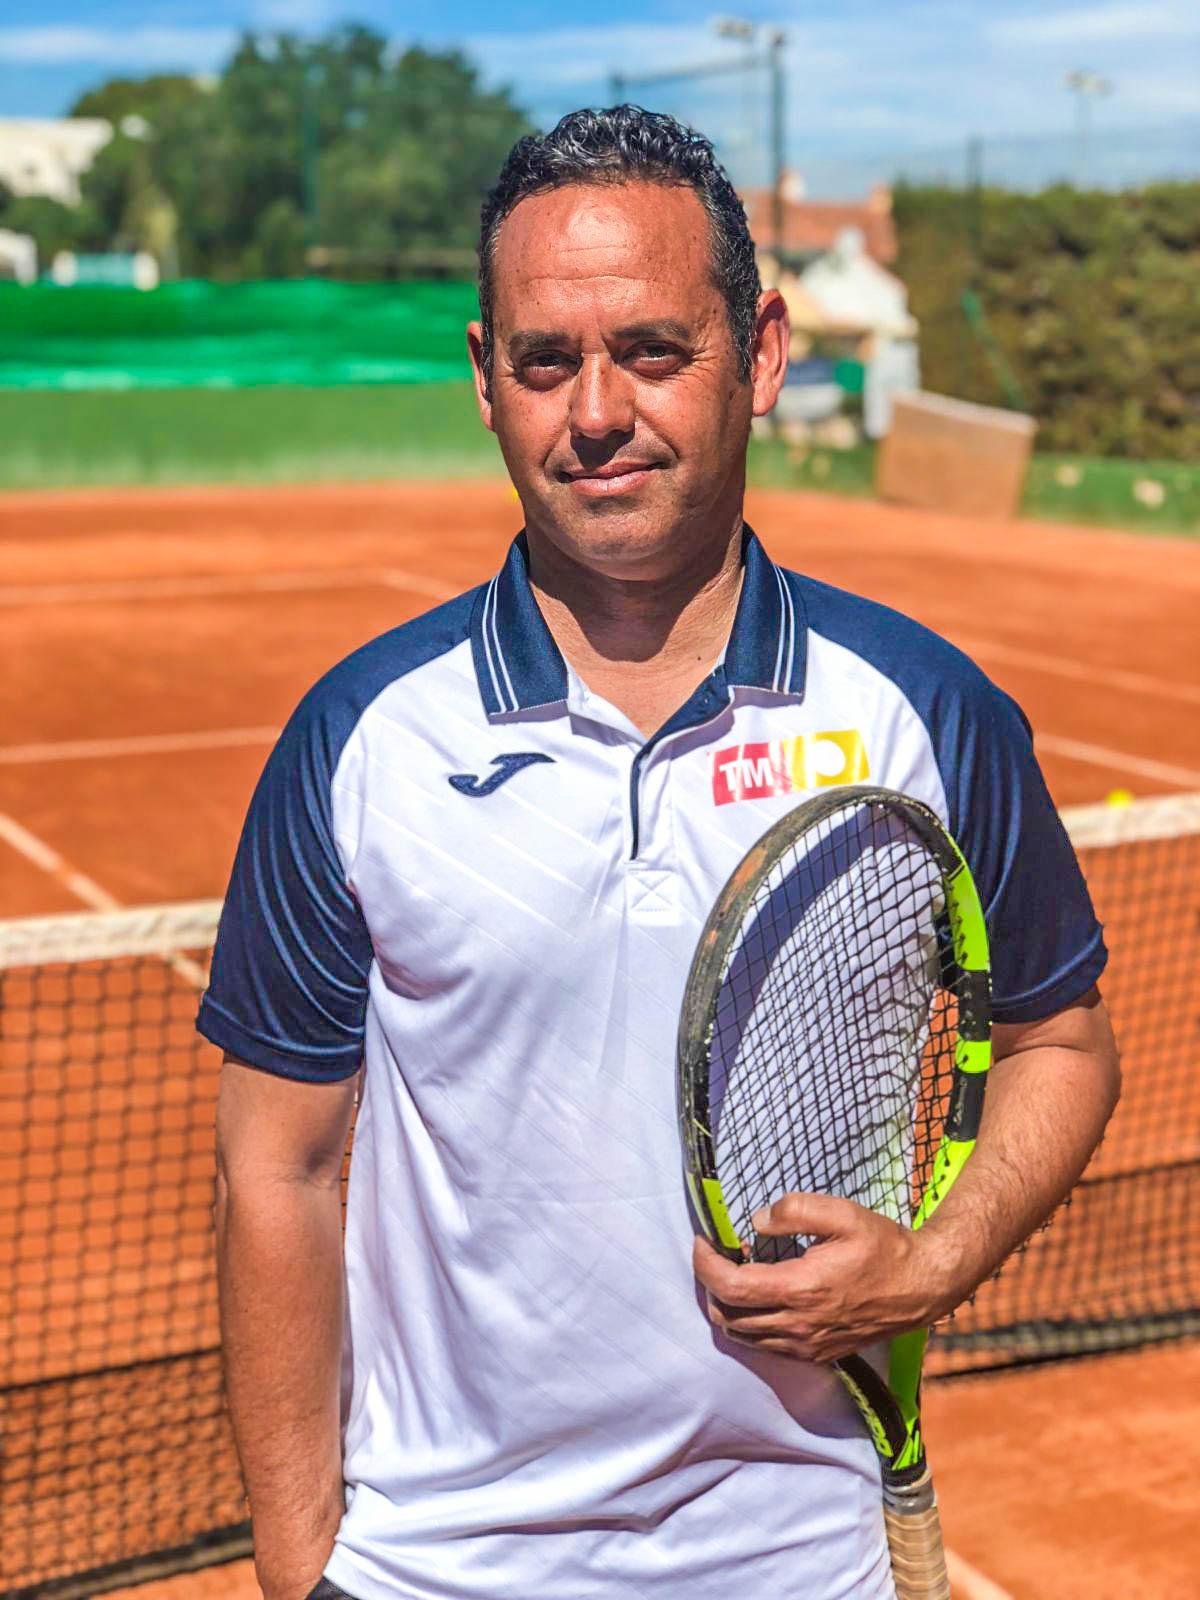 David Pérez Lalanda